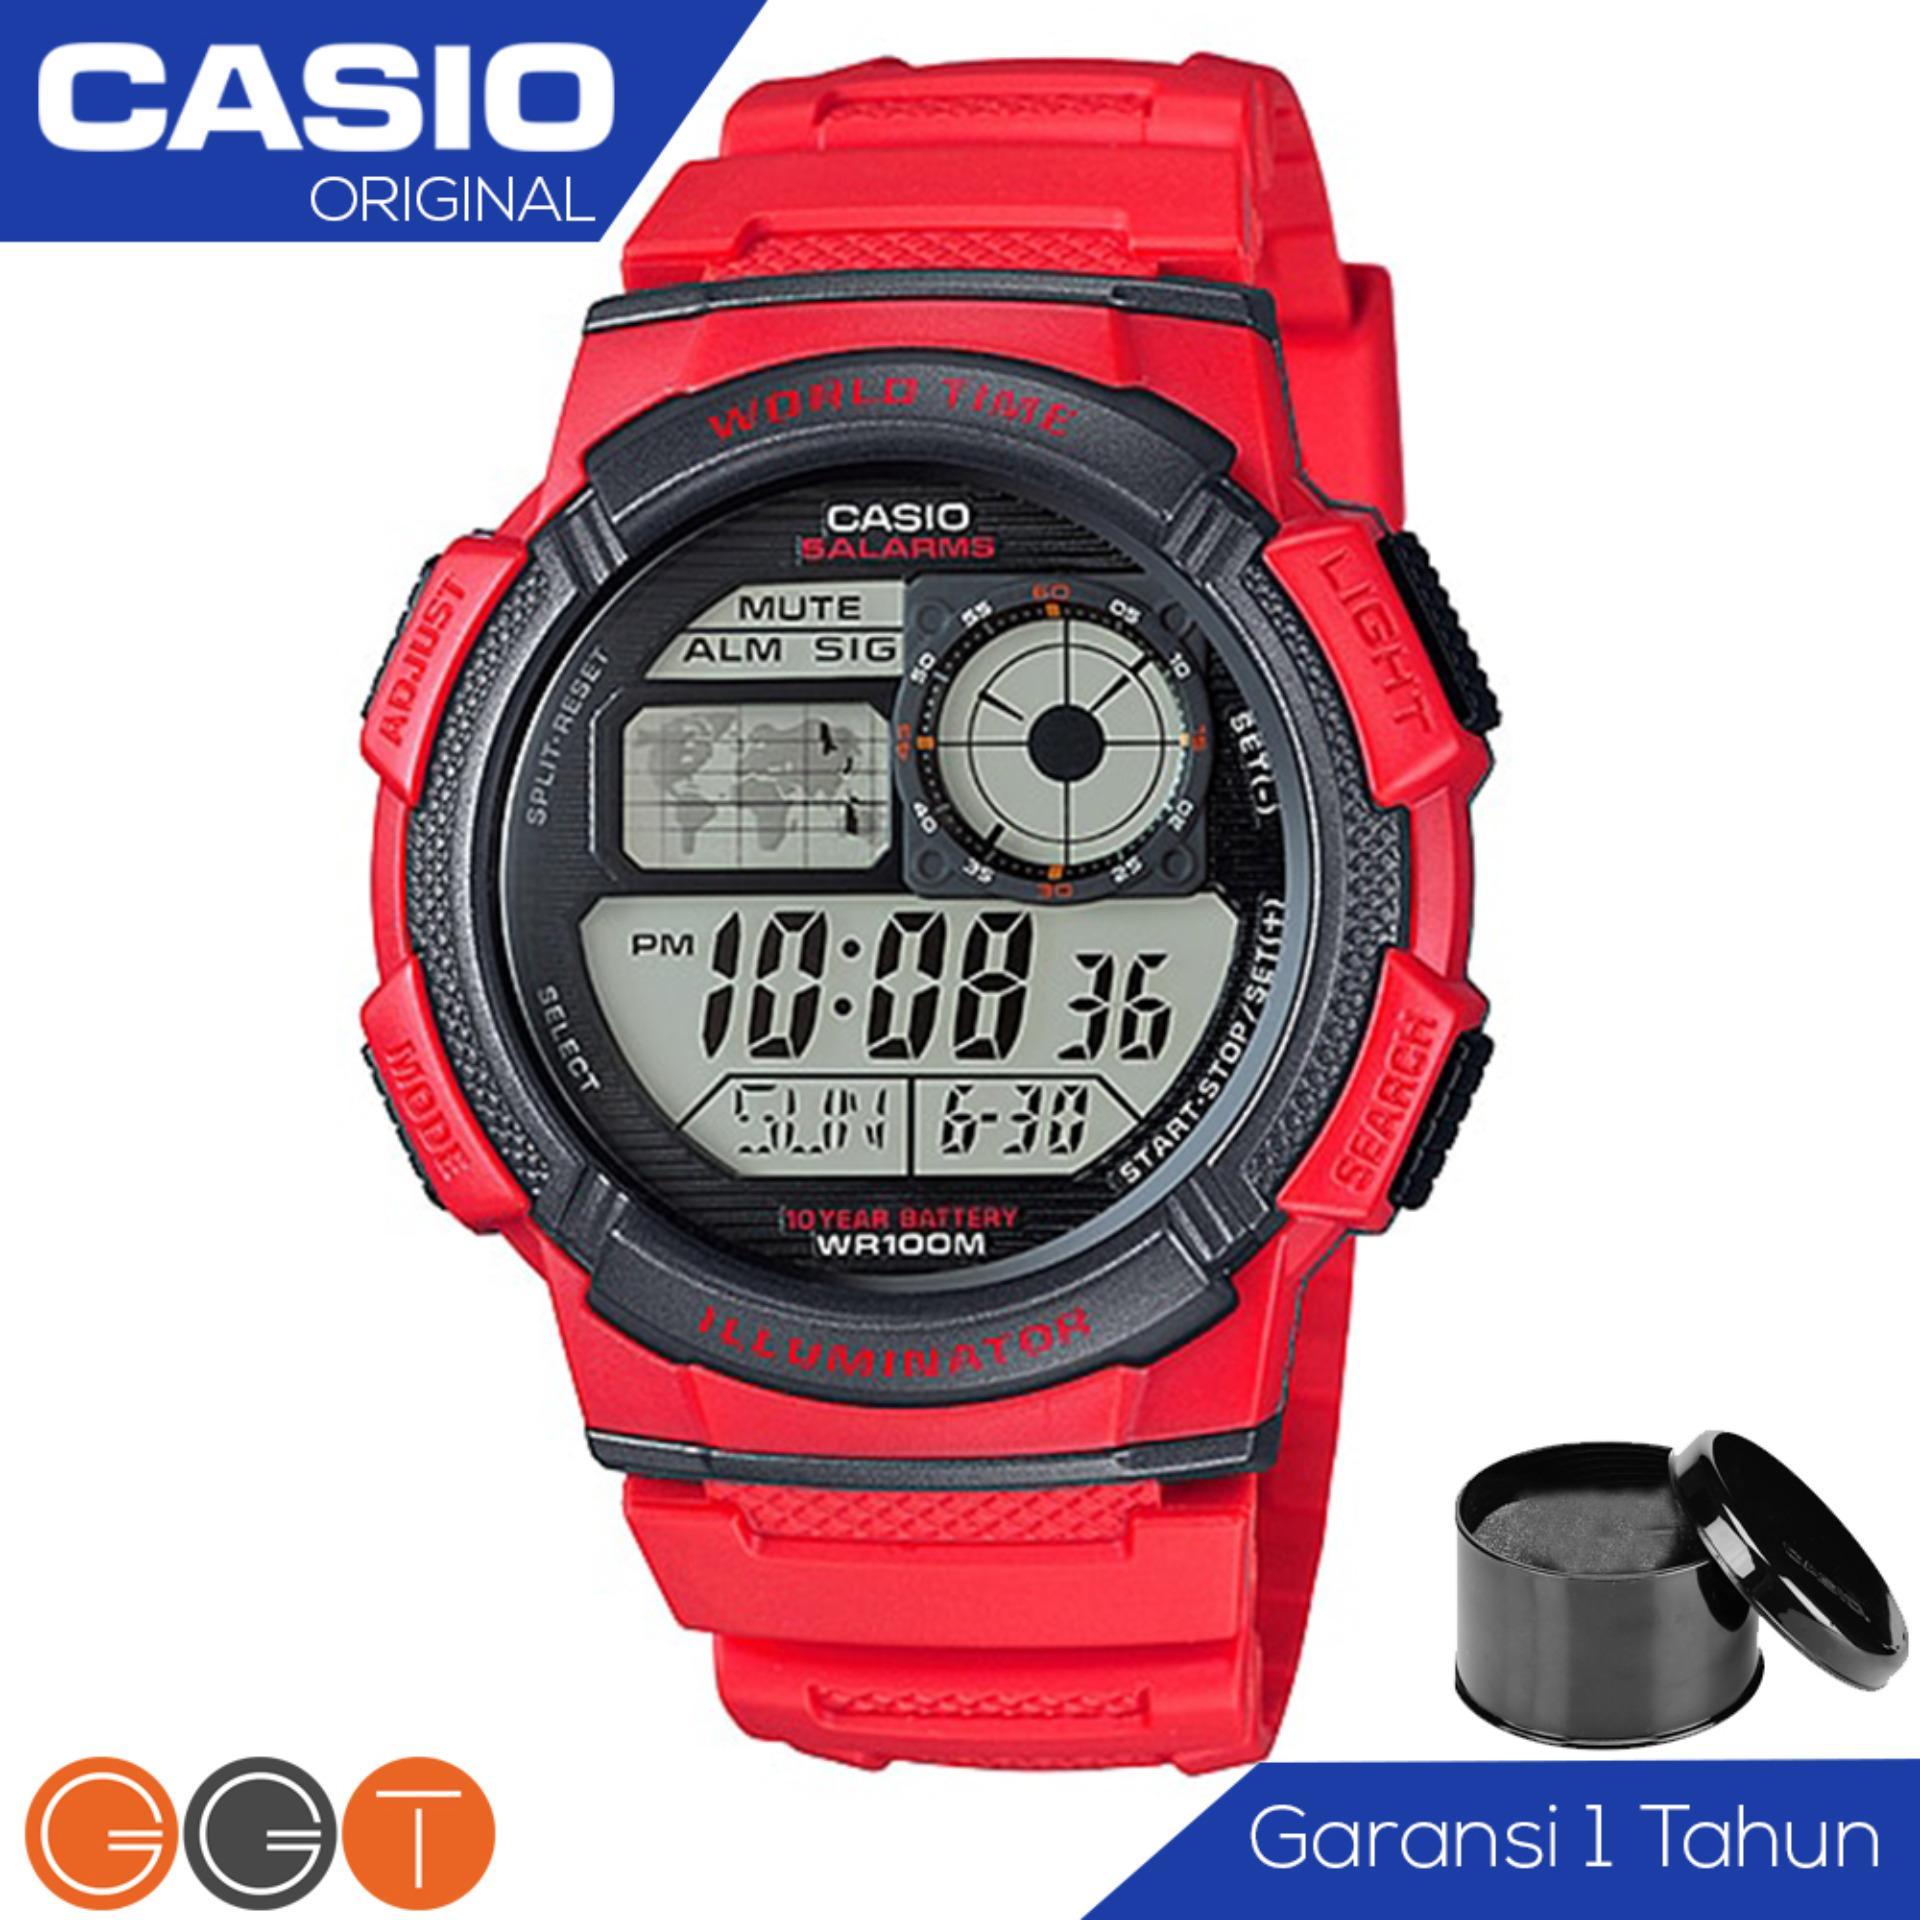 Harga Casio Illuminator Ae 1000W 4Avdf Jam Tangan Pria Tali Karet Digital Movement Red Origin